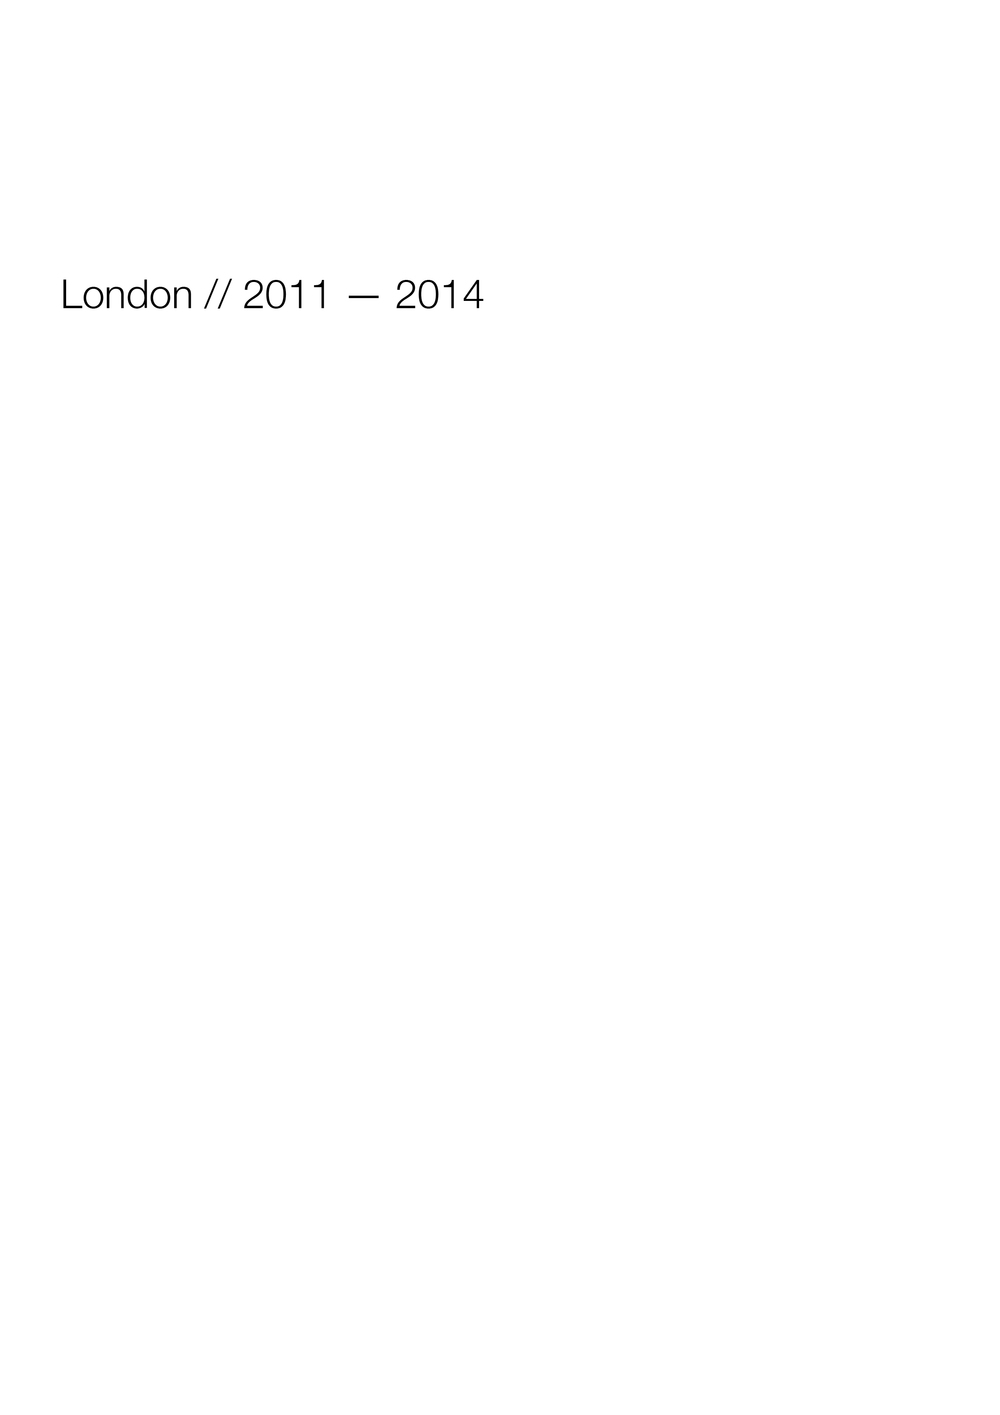 london_text2.jpg